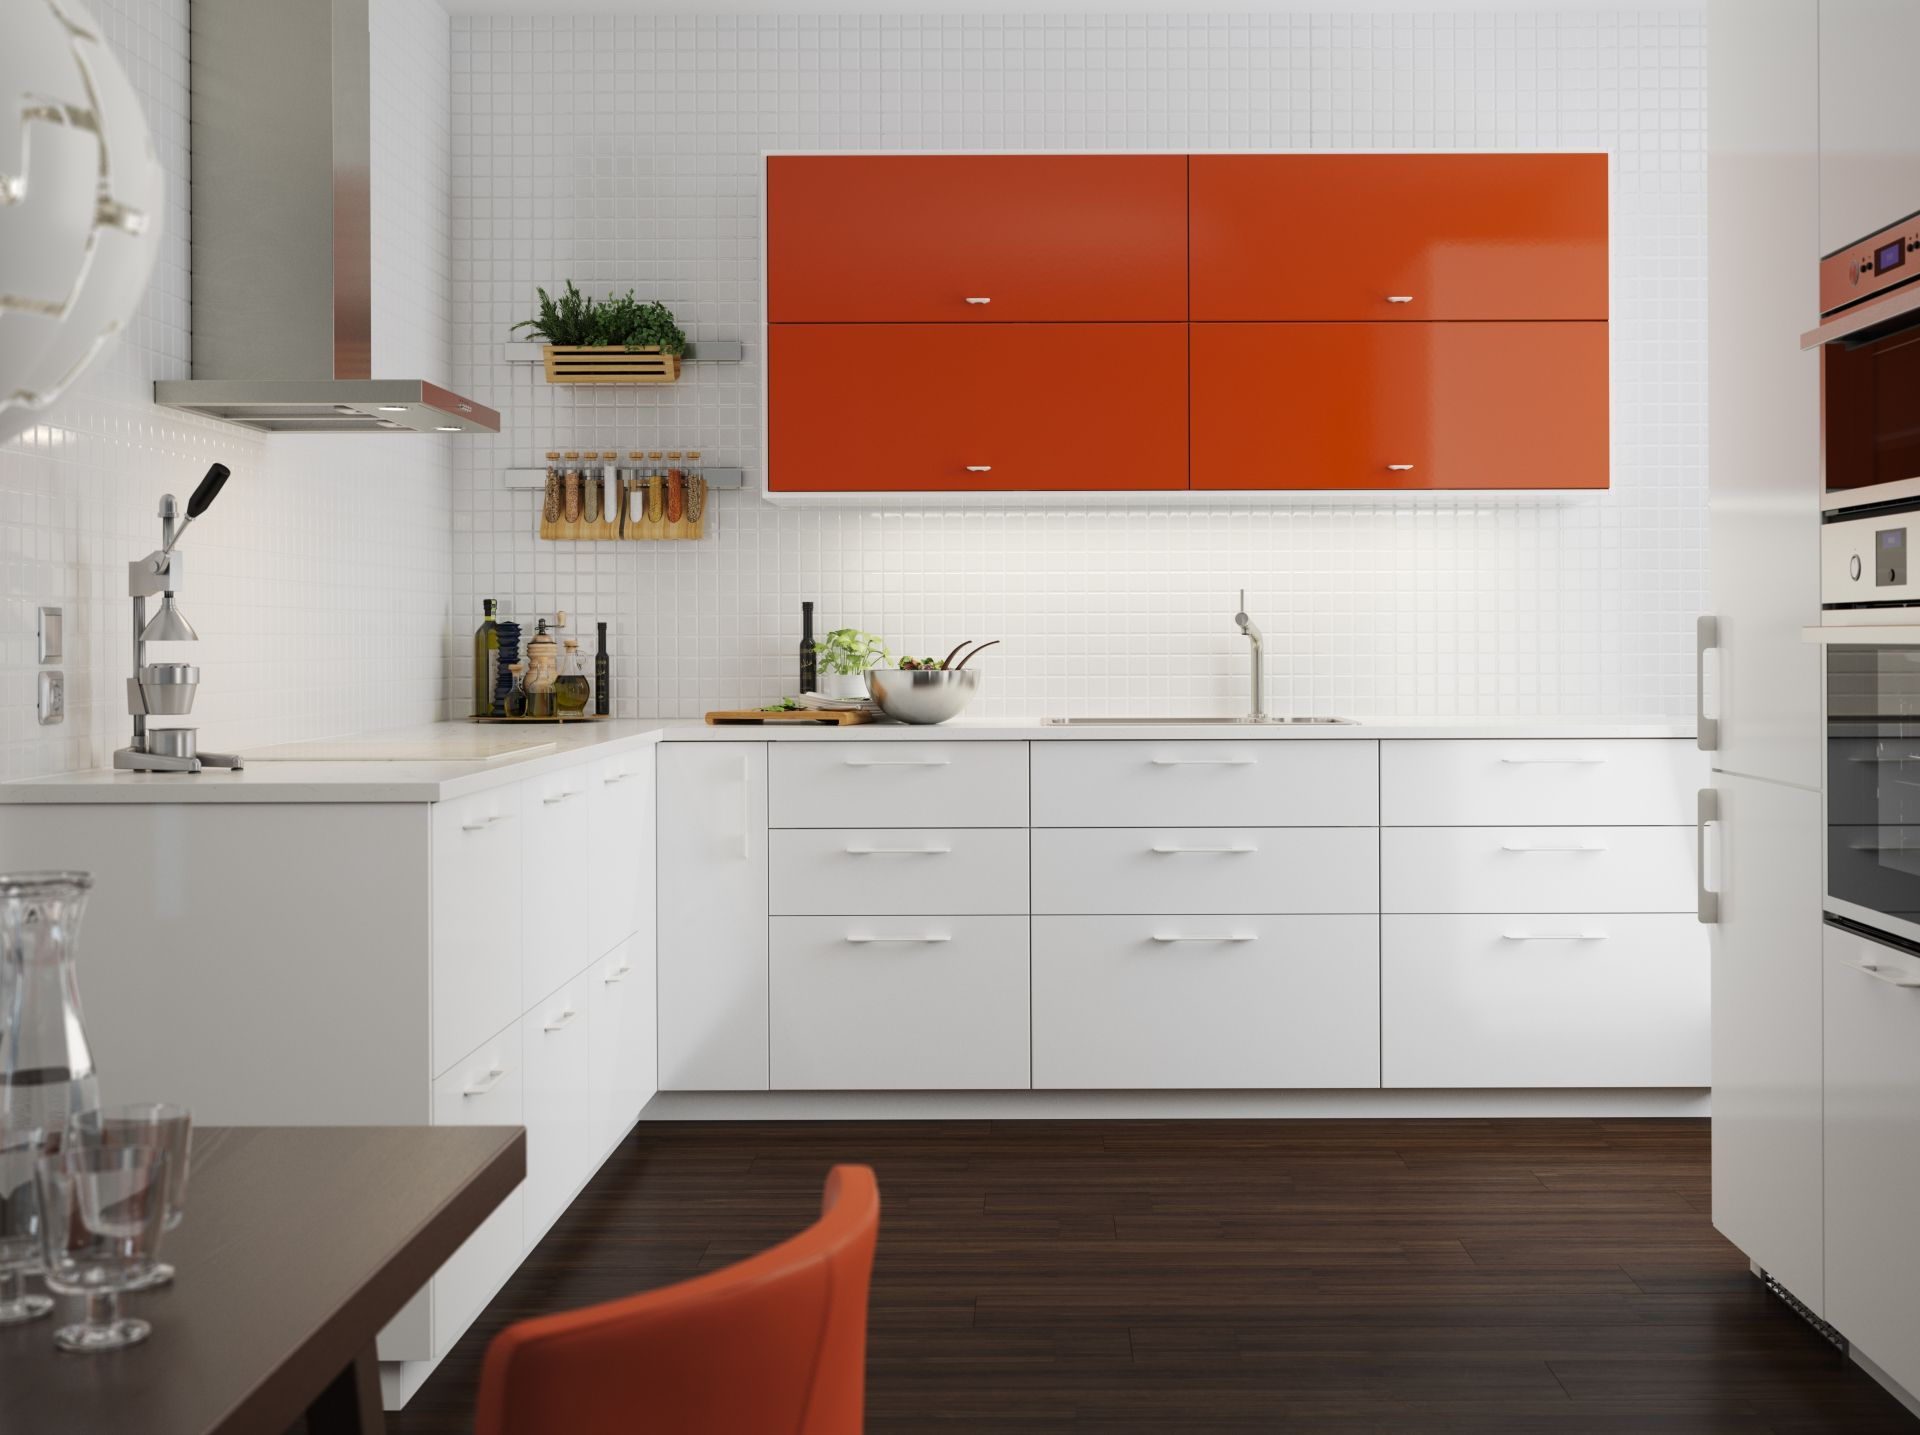 Ikea Com Tienda De Muebles Y Decoracion Online Ikea Kitchen Design Ikea Small Kitchen Orange Kitchen Walls Ikea com kitchen cabinets